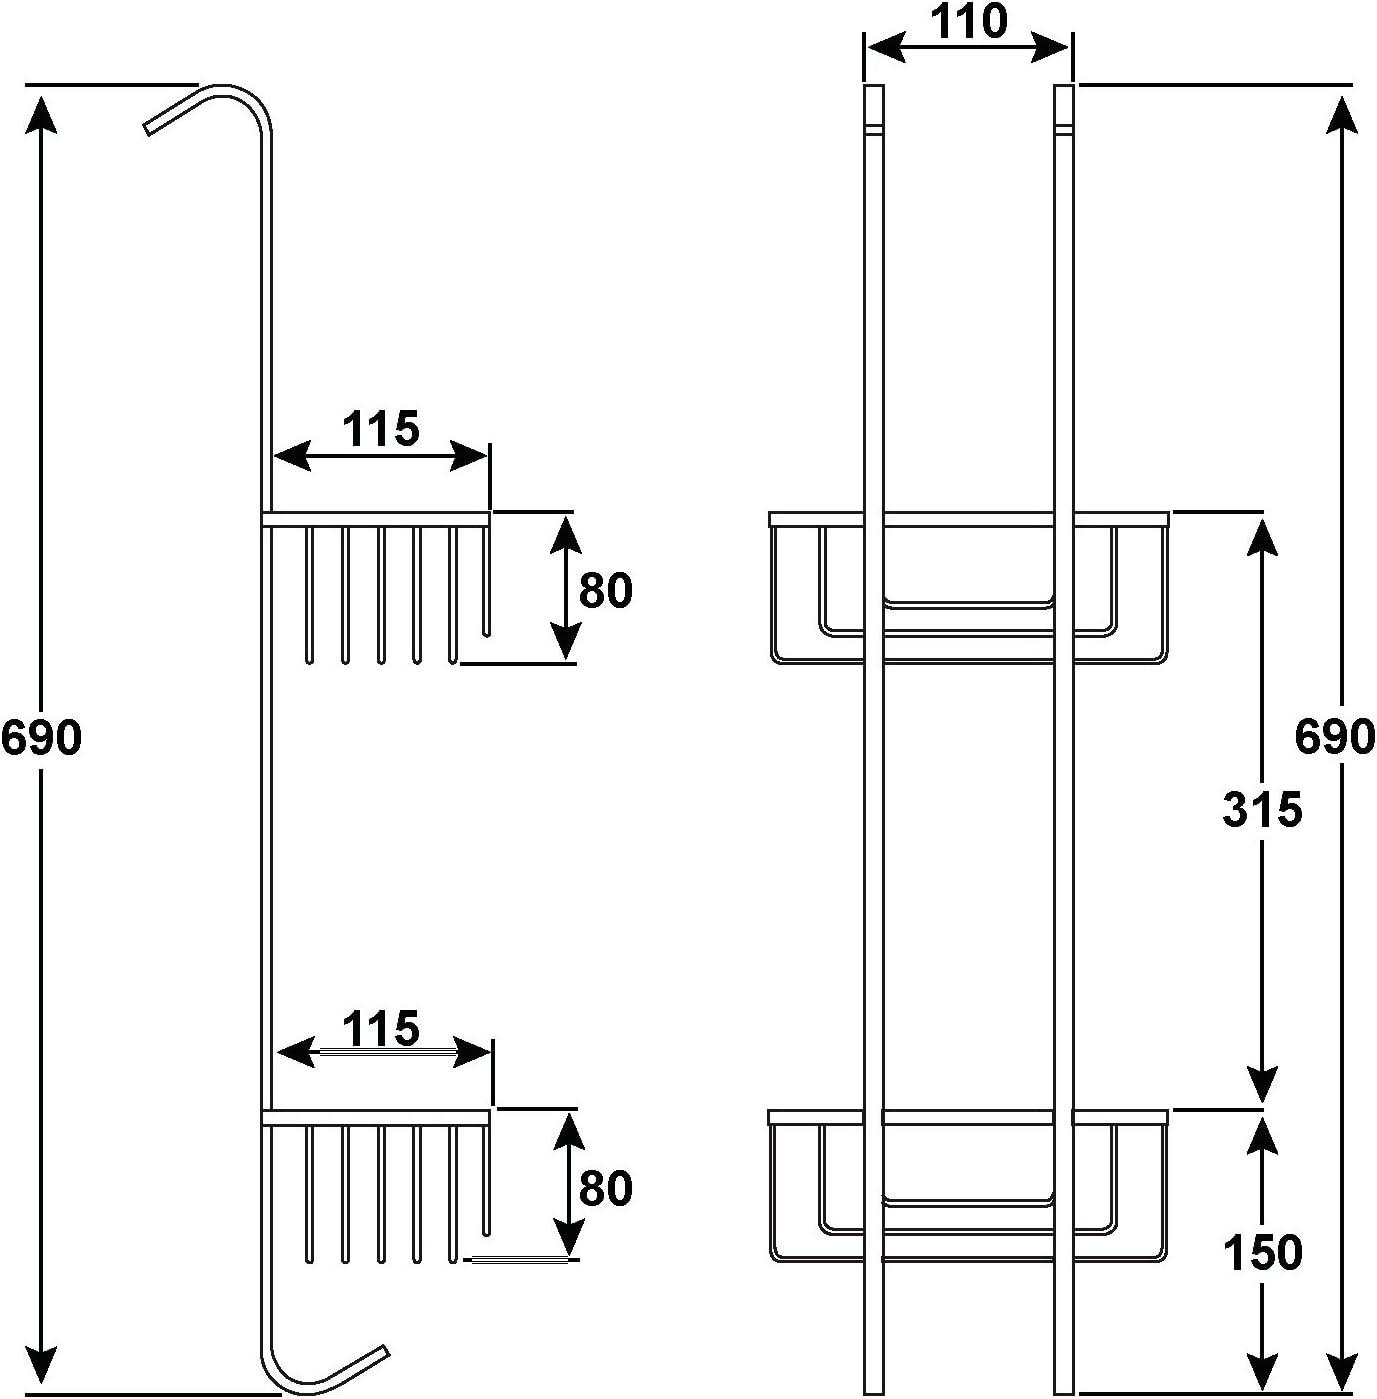 de cromo de acero inoxidable DMKO01 Estante de ducha Duschmeister con 2 cestas de almacenaje colgantes para champ/ú